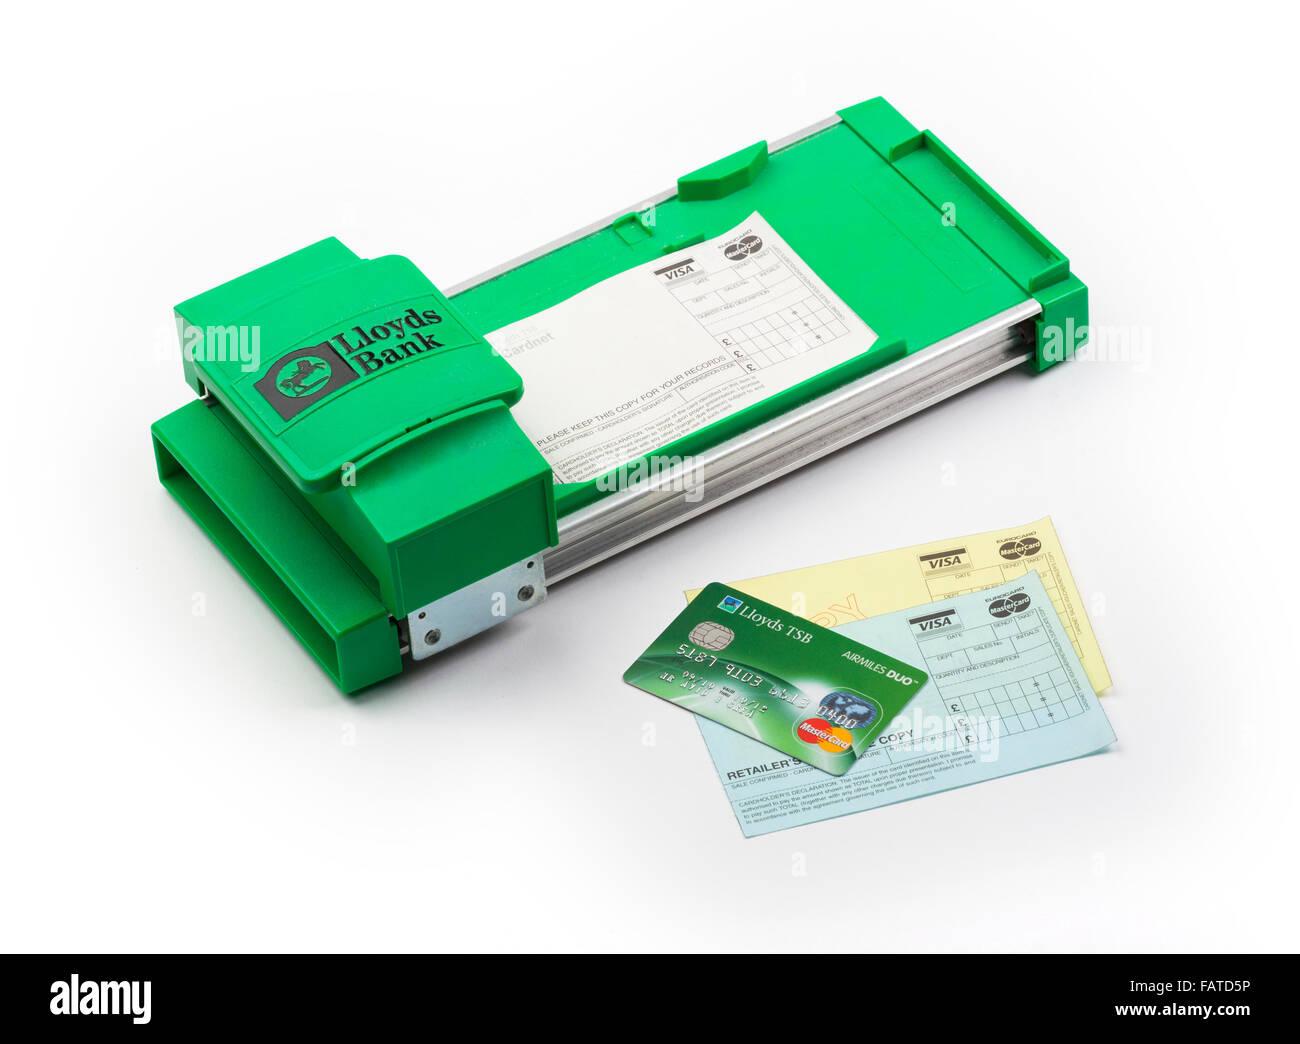 Kreditkarten-Imprinter Maschine manuell betrieben Stockfoto